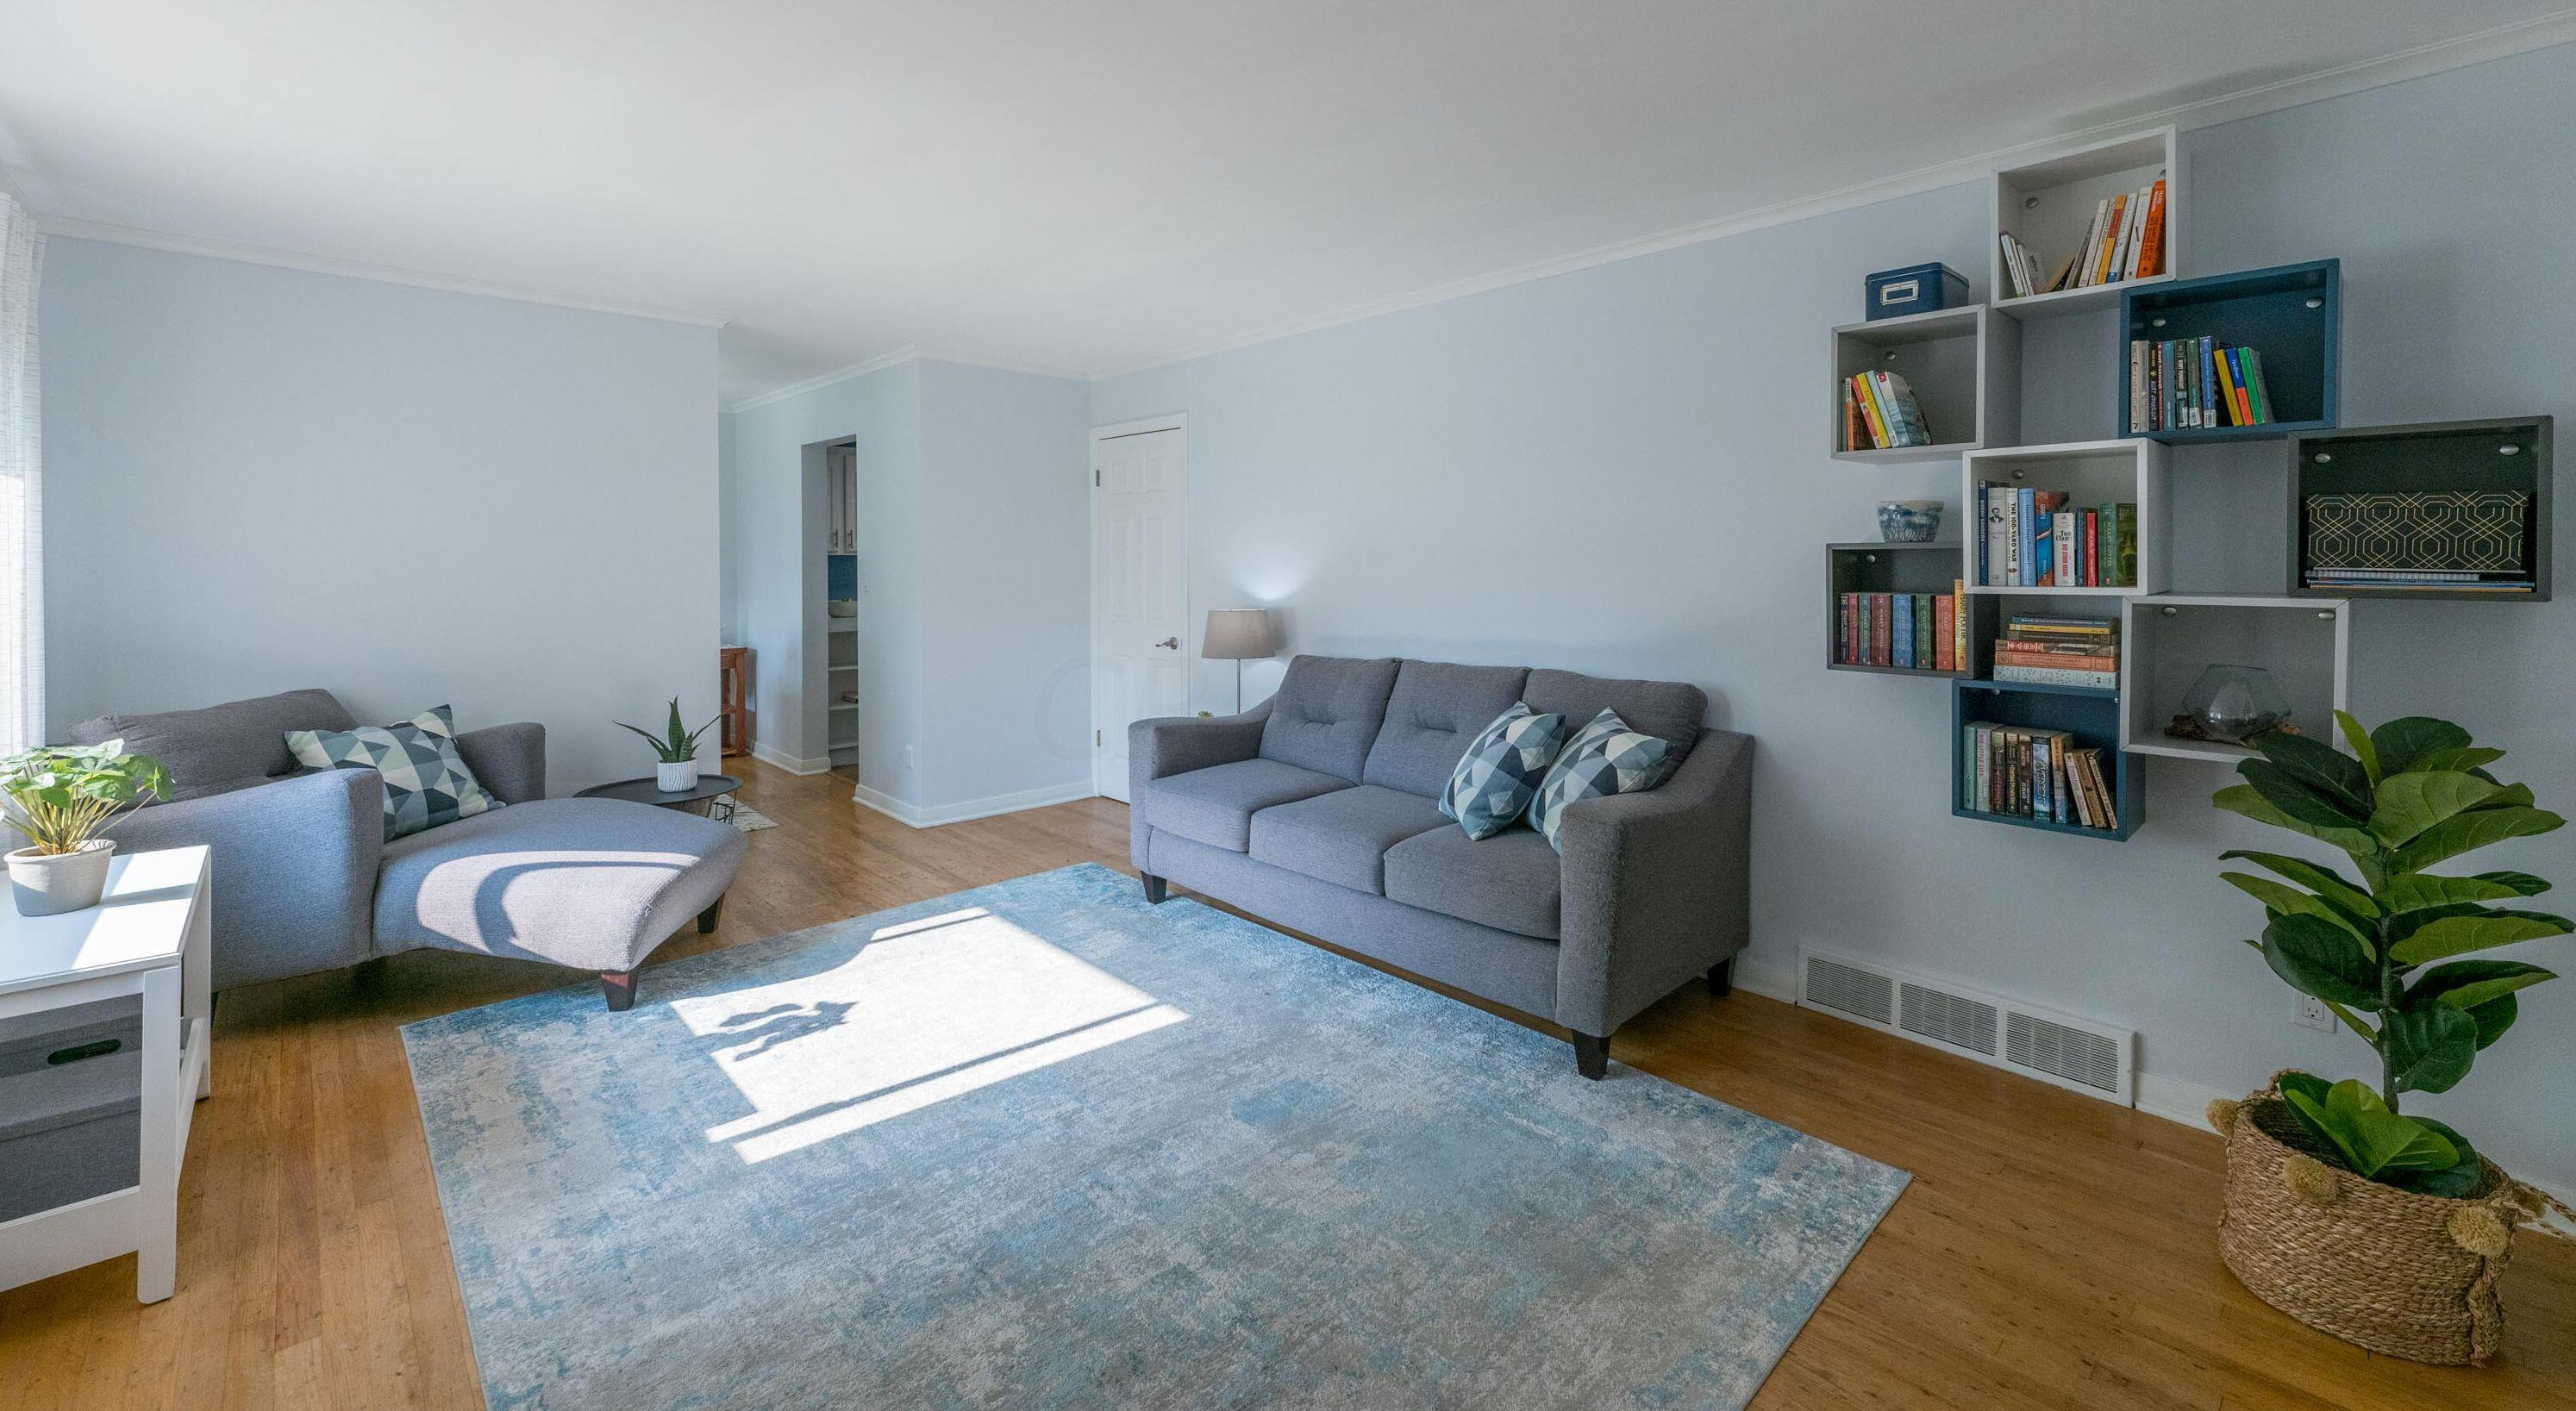 Living room has original hardwood floors